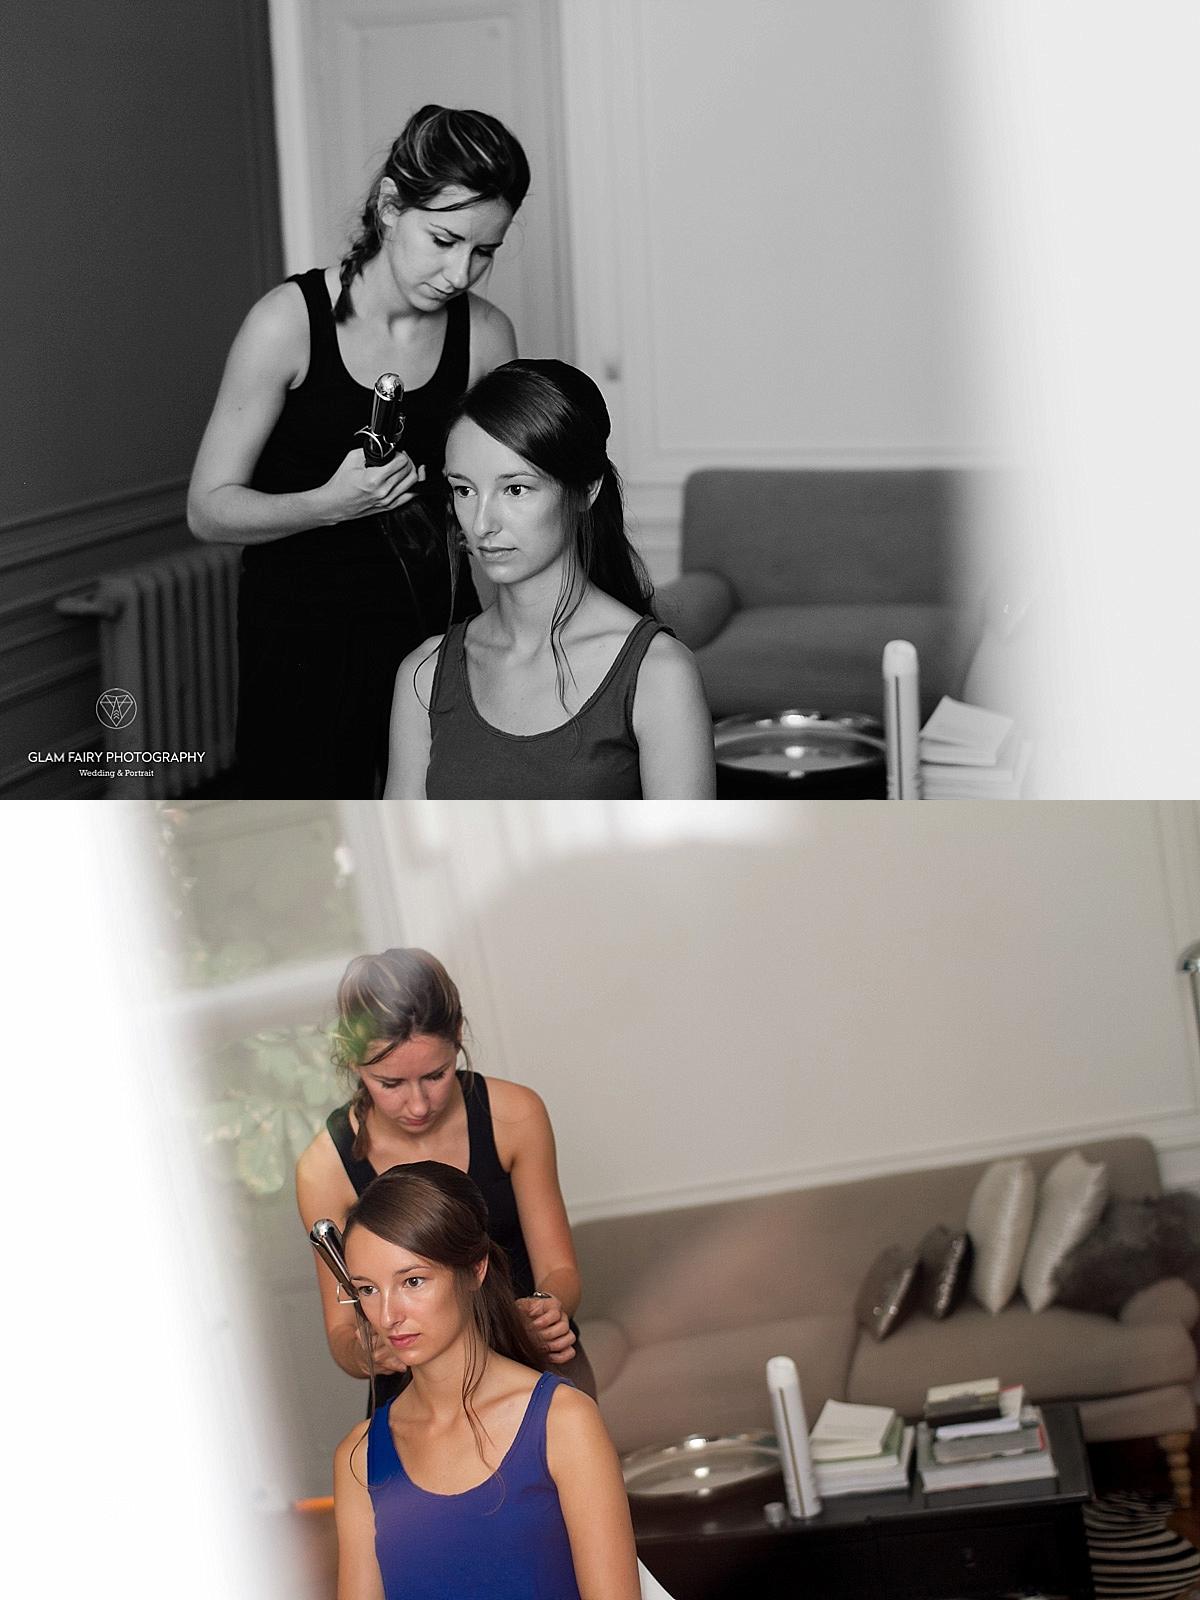 GlamFairyPhotography-sublimer-la-mariee-v4_0006